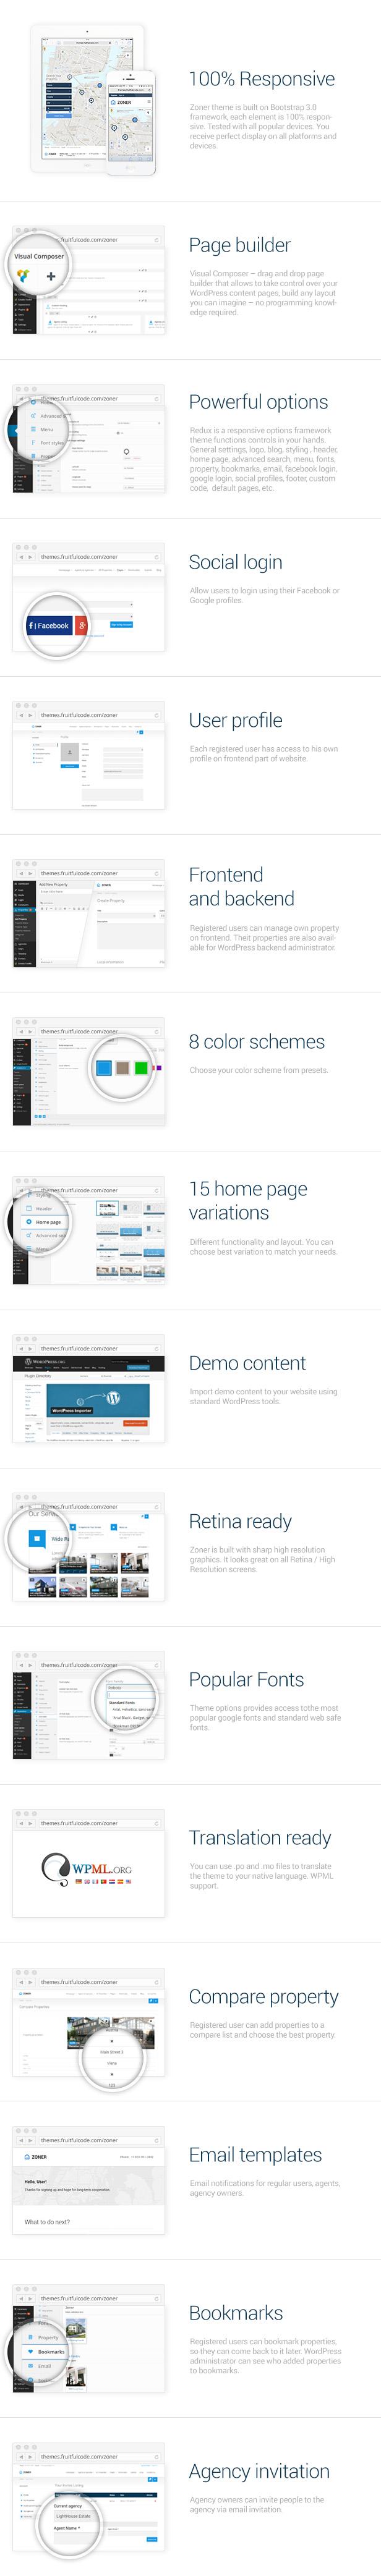 Zoner - Real Estate WordPress Theme - 3